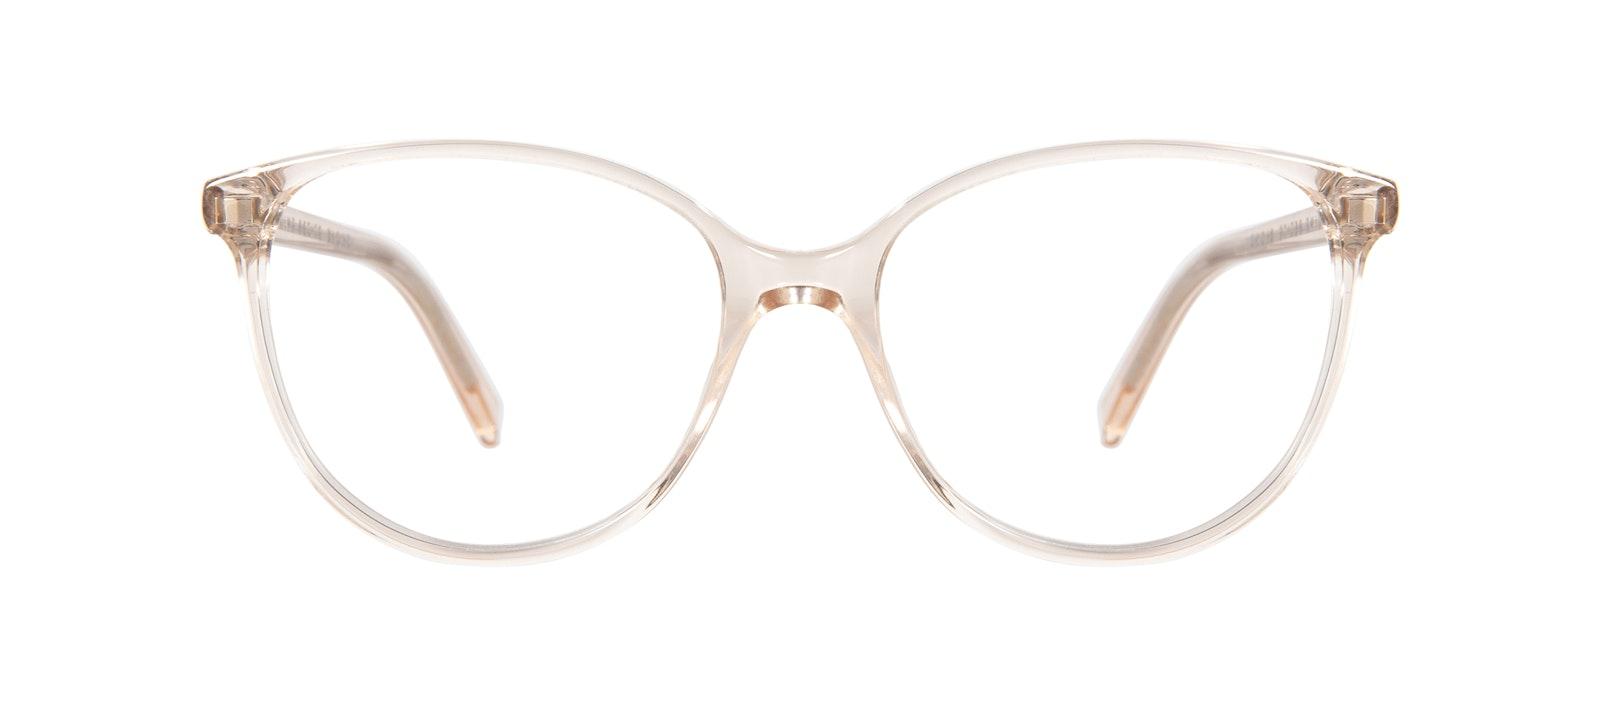 Affordable Fashion Glasses Cat Eye Eyeglasses Women Imagine XS Blond Front